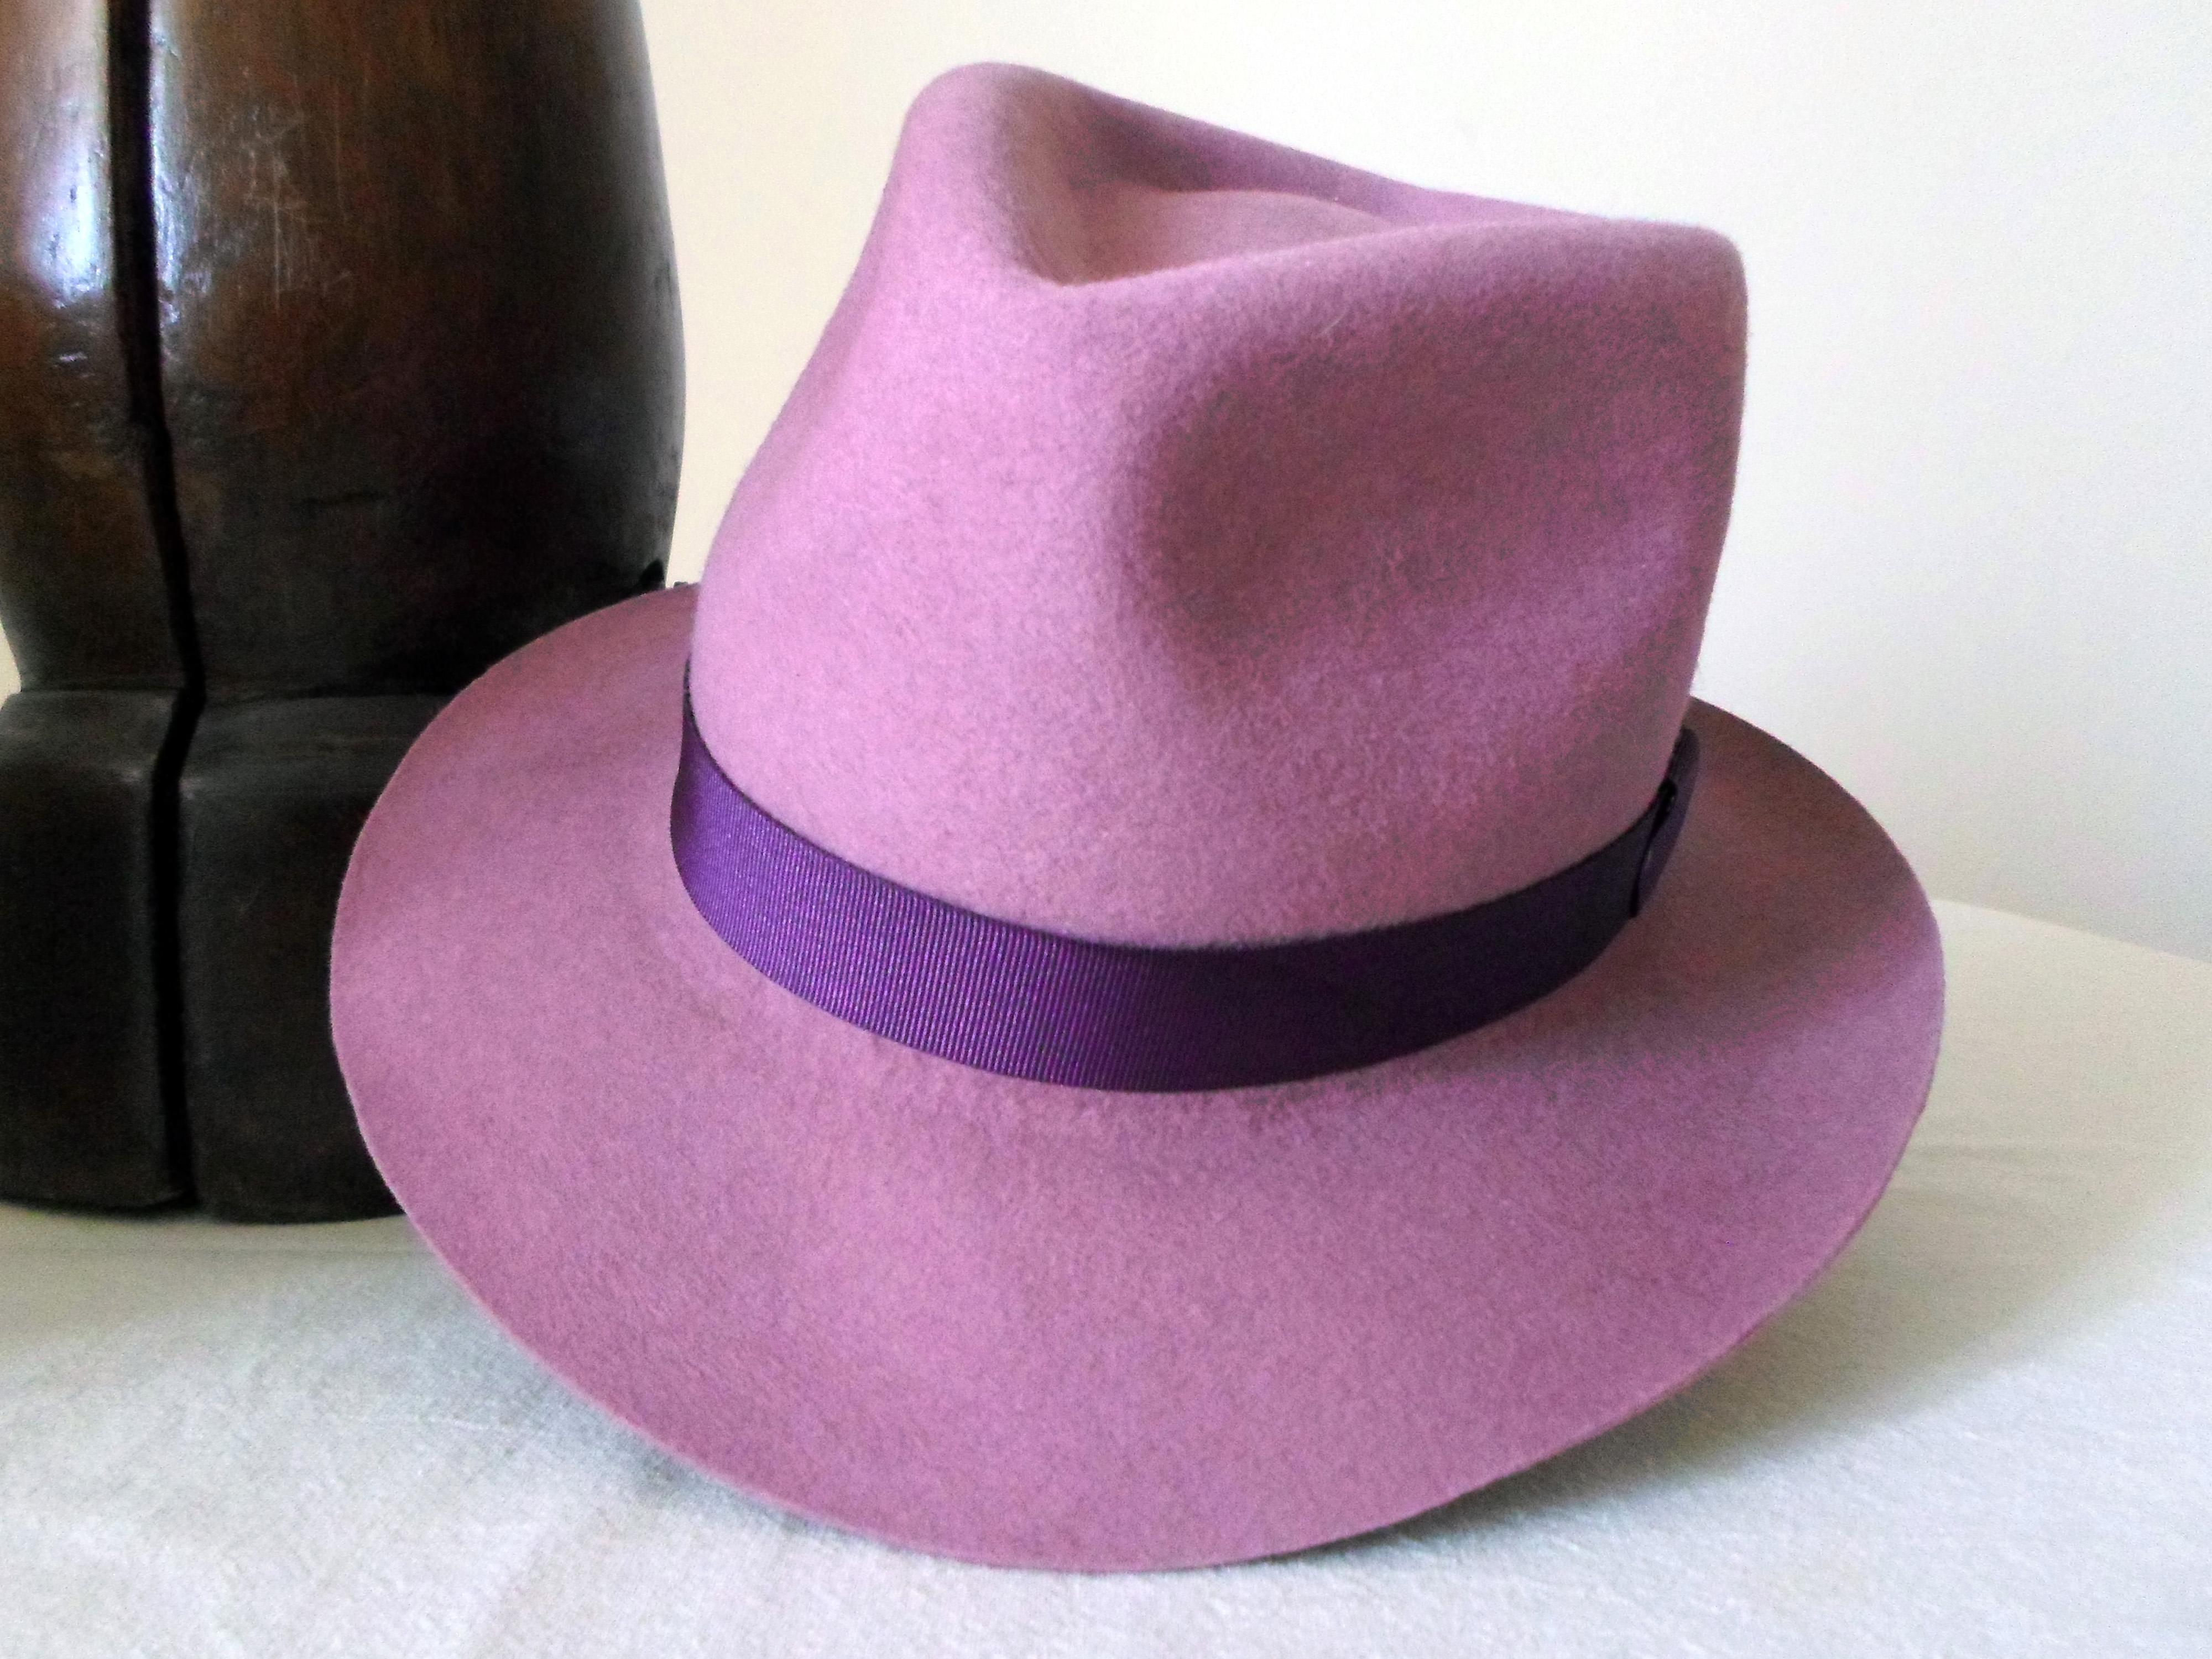 Lavender Pink Wool Felt Fedora - Wide Brim Merino Wool Felt Handmade ... a4ac55cbbd6